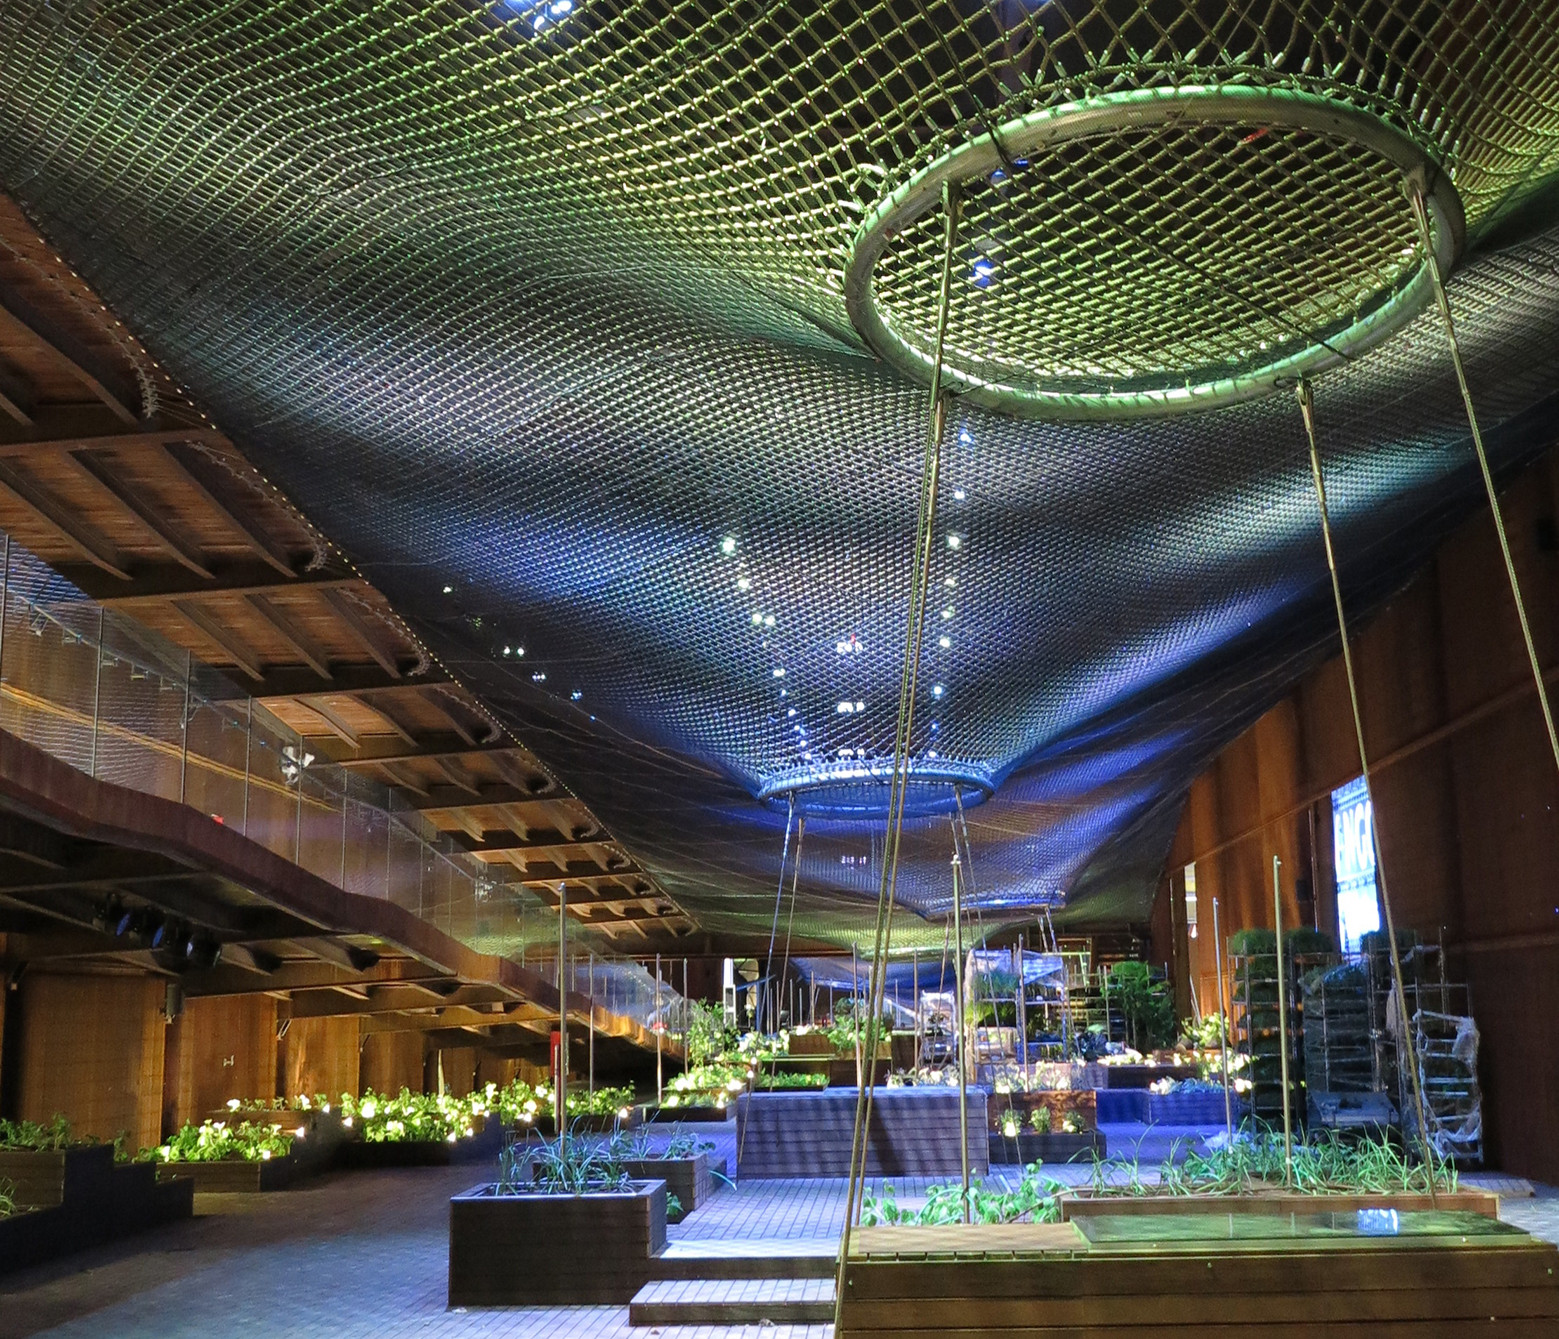 Brazil_Pavilion_-_AtelierMarkoBrajovic_05